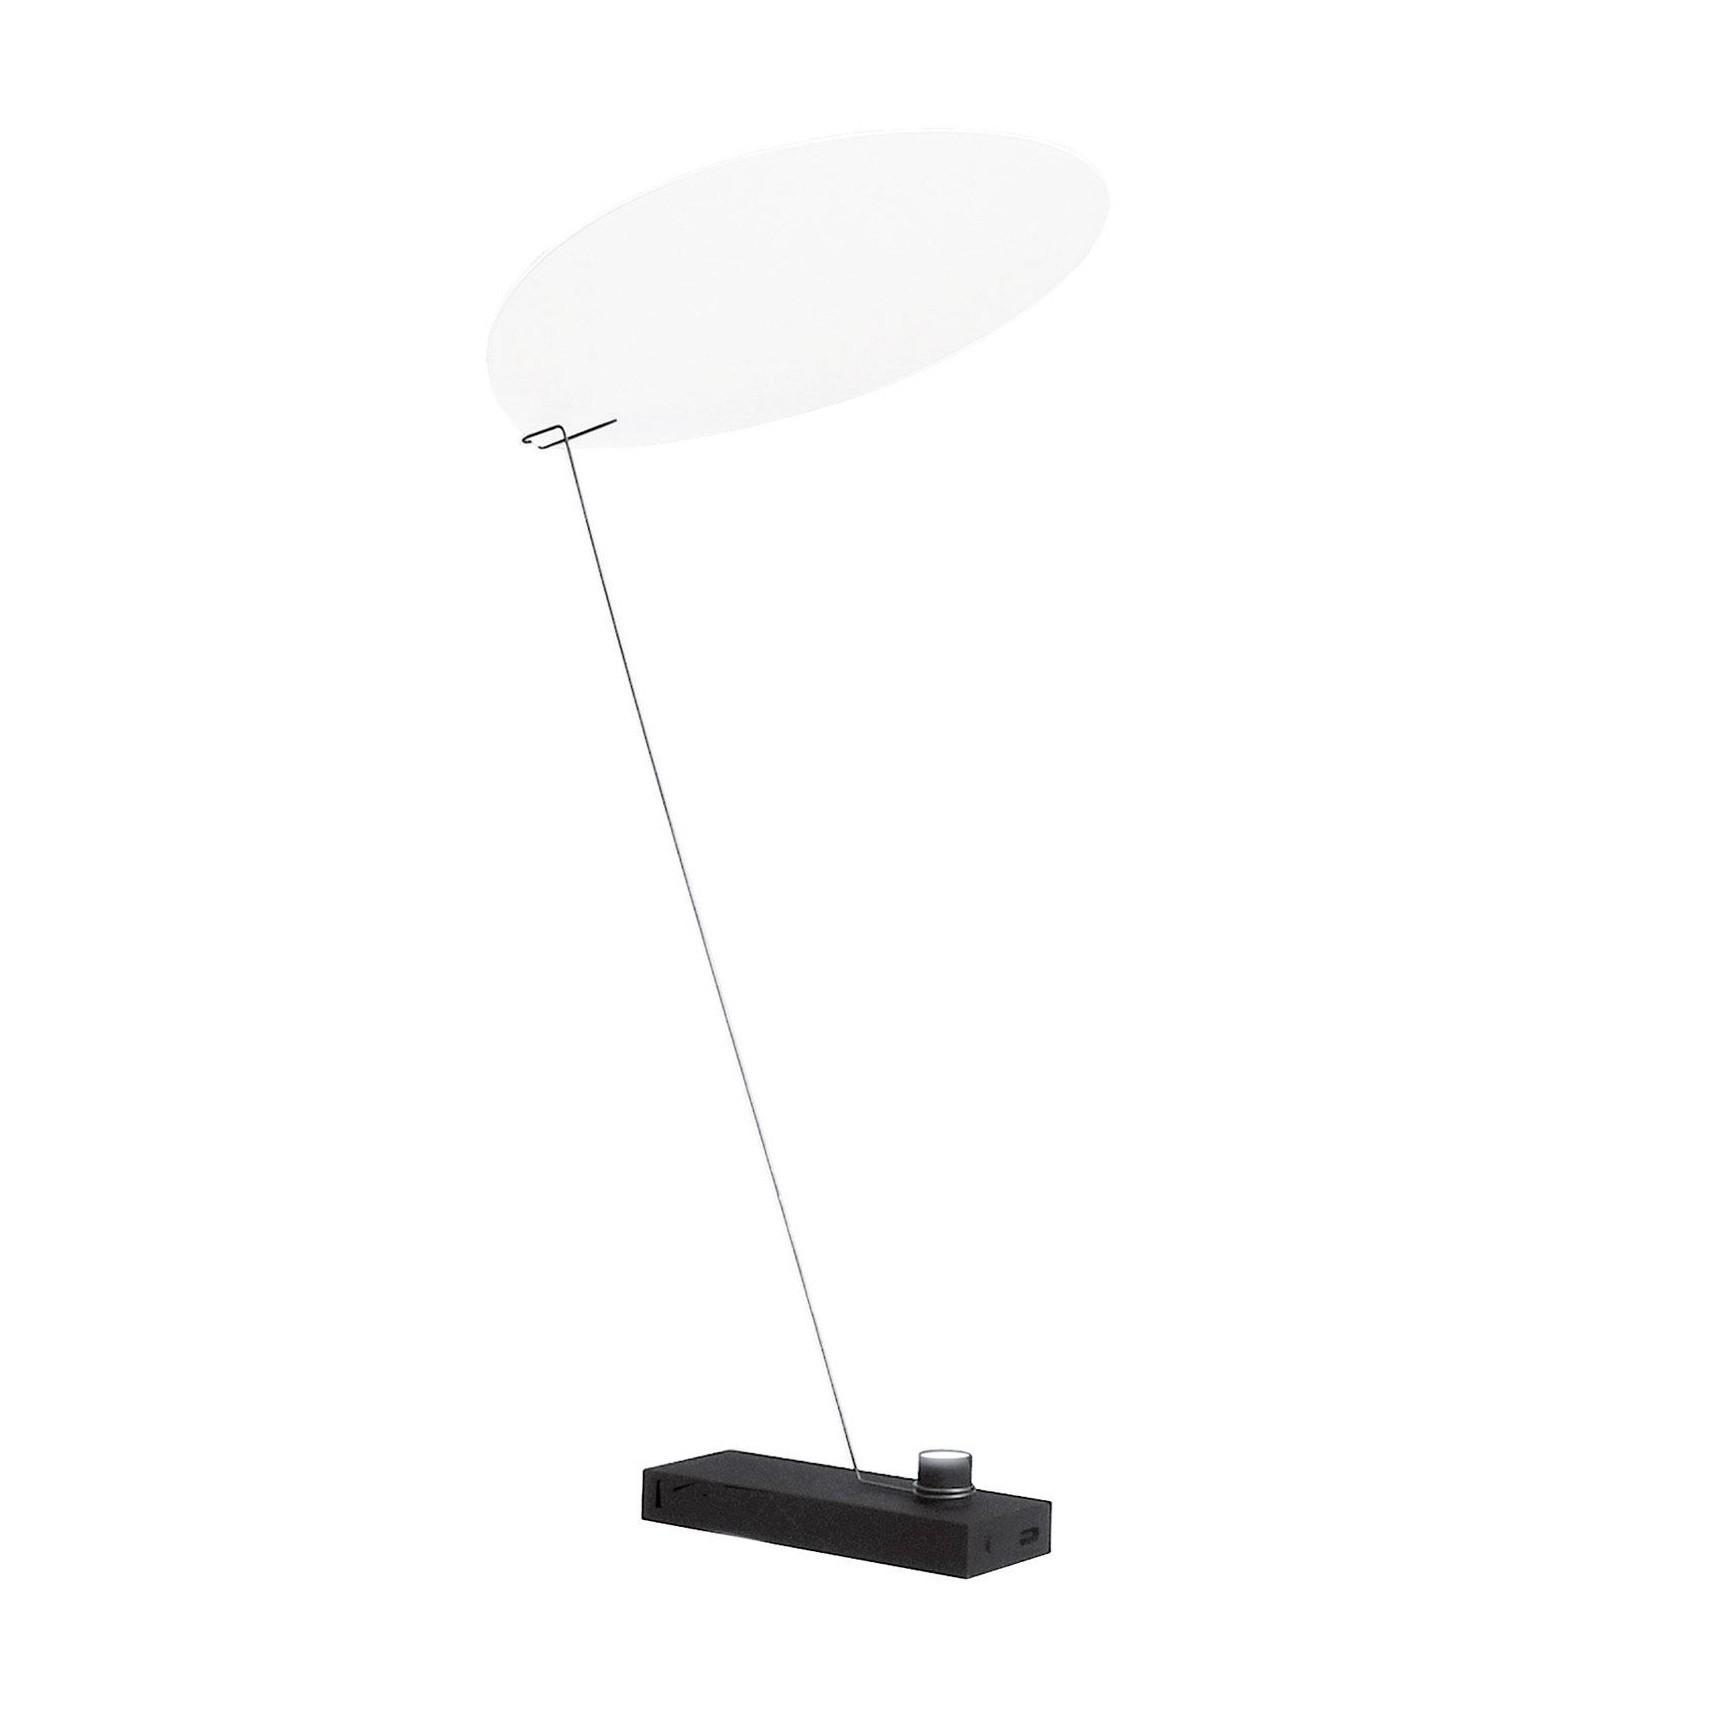 Lampe De Koyoo Batterie E9hwid2 Table Led Avec 8wmNvn0